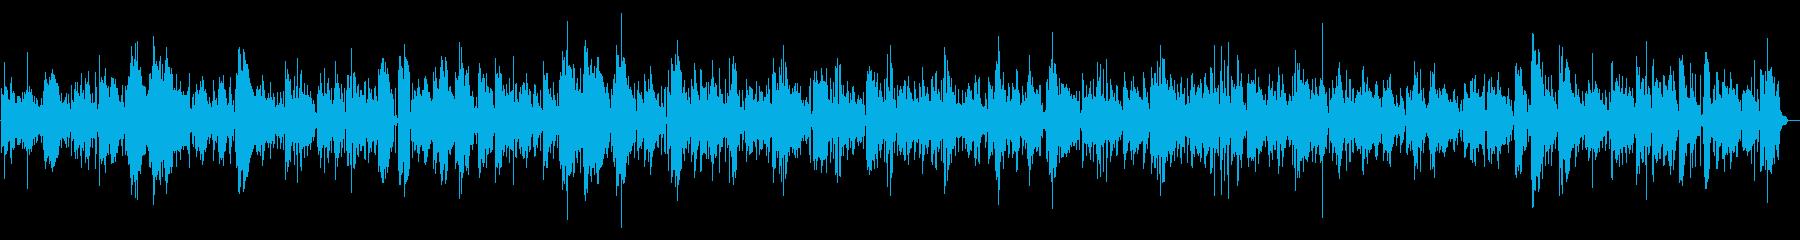 BARで聴く大人のムードなジャズバラードの再生済みの波形